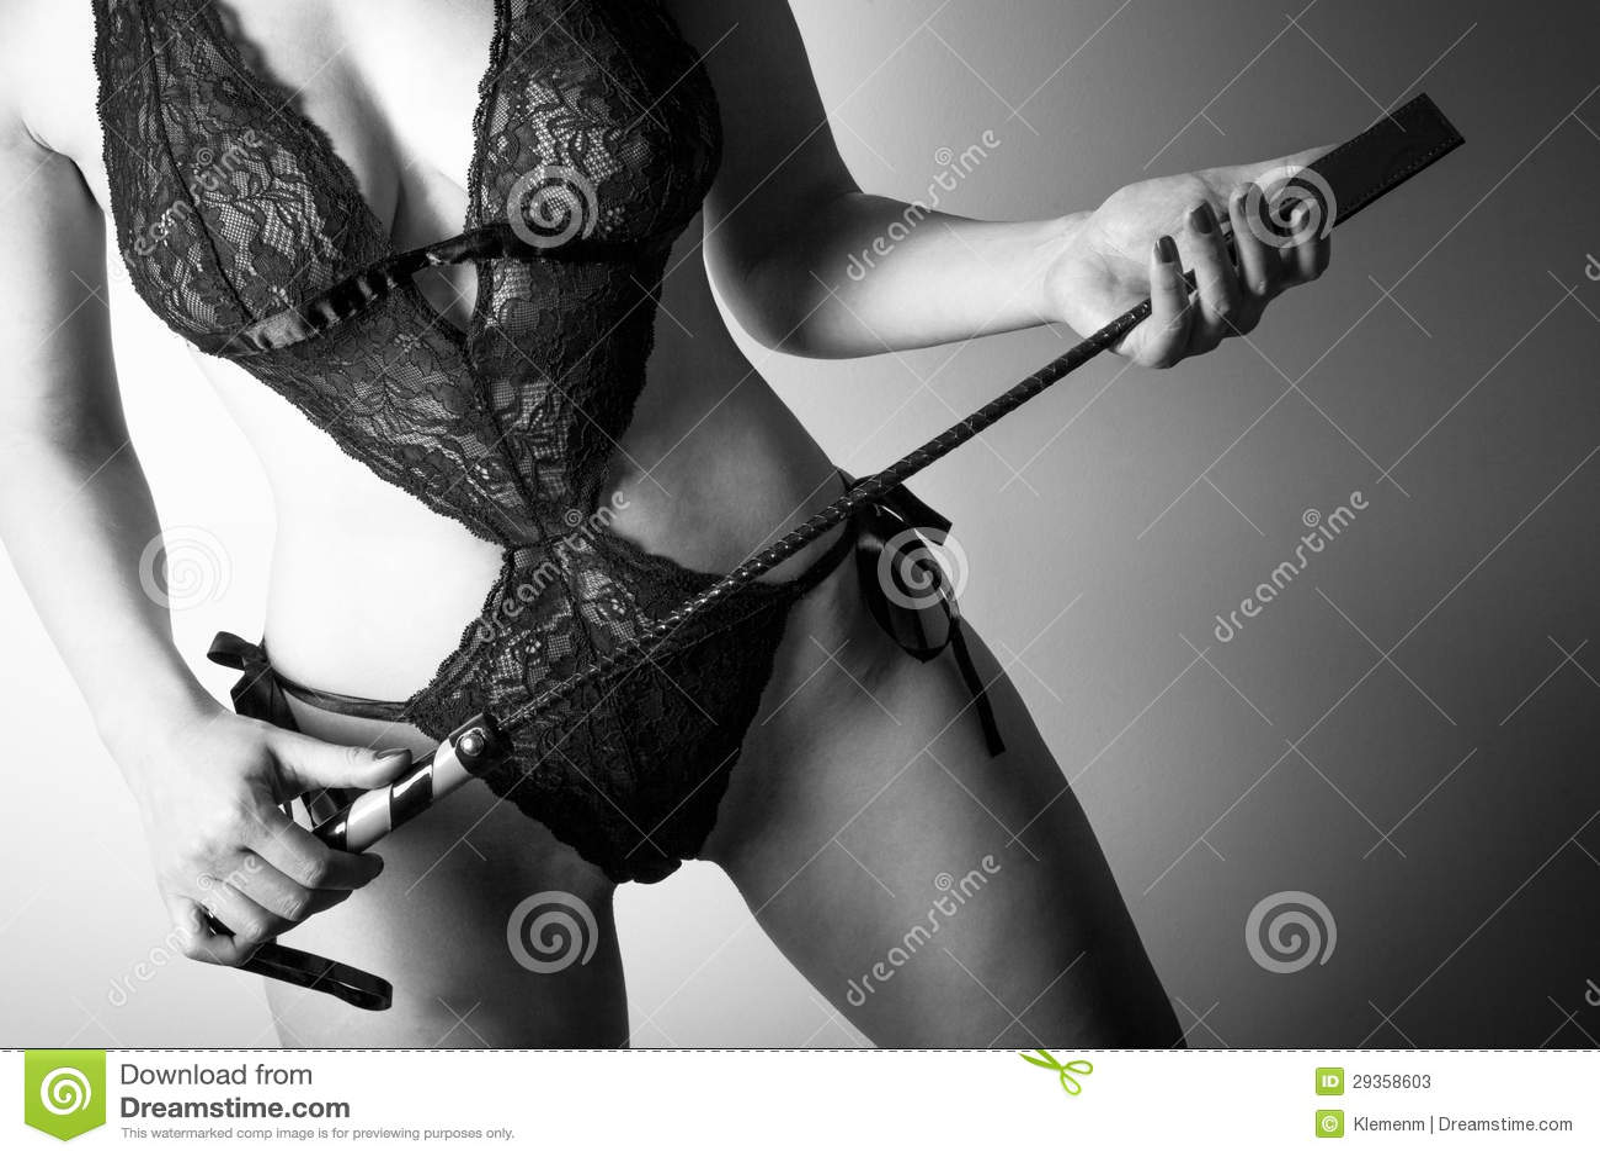 The same Dominatrix leather mistress